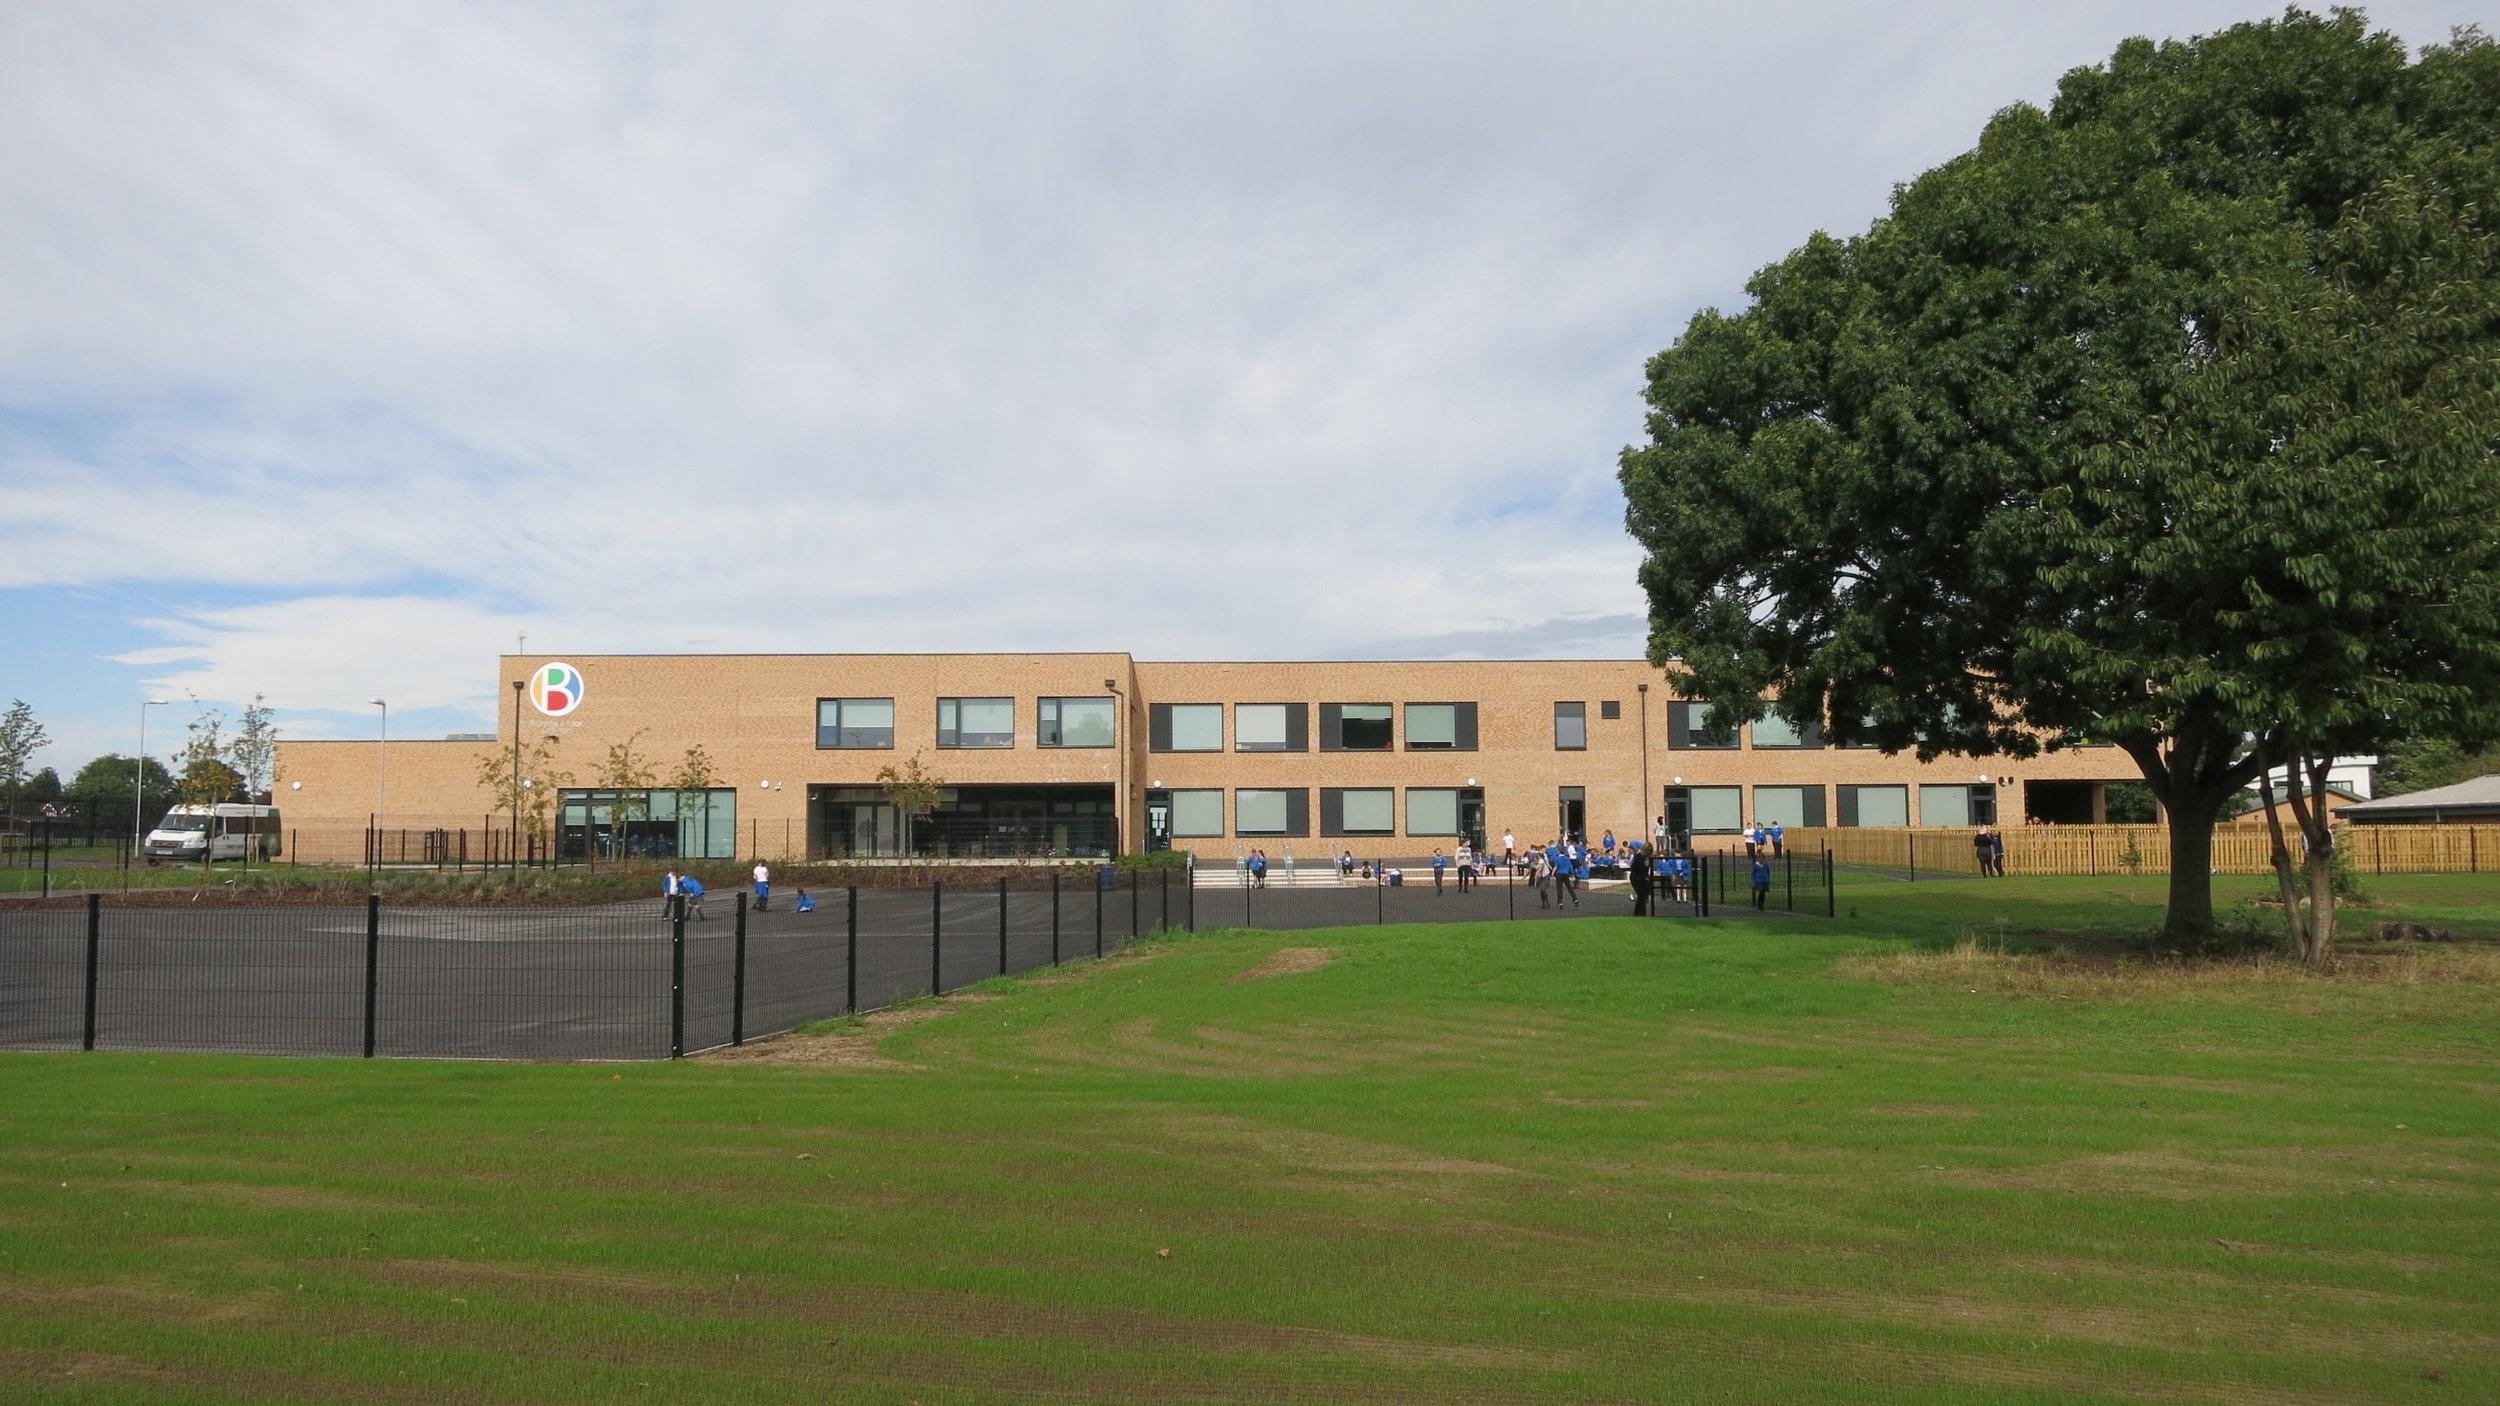 Brumby School